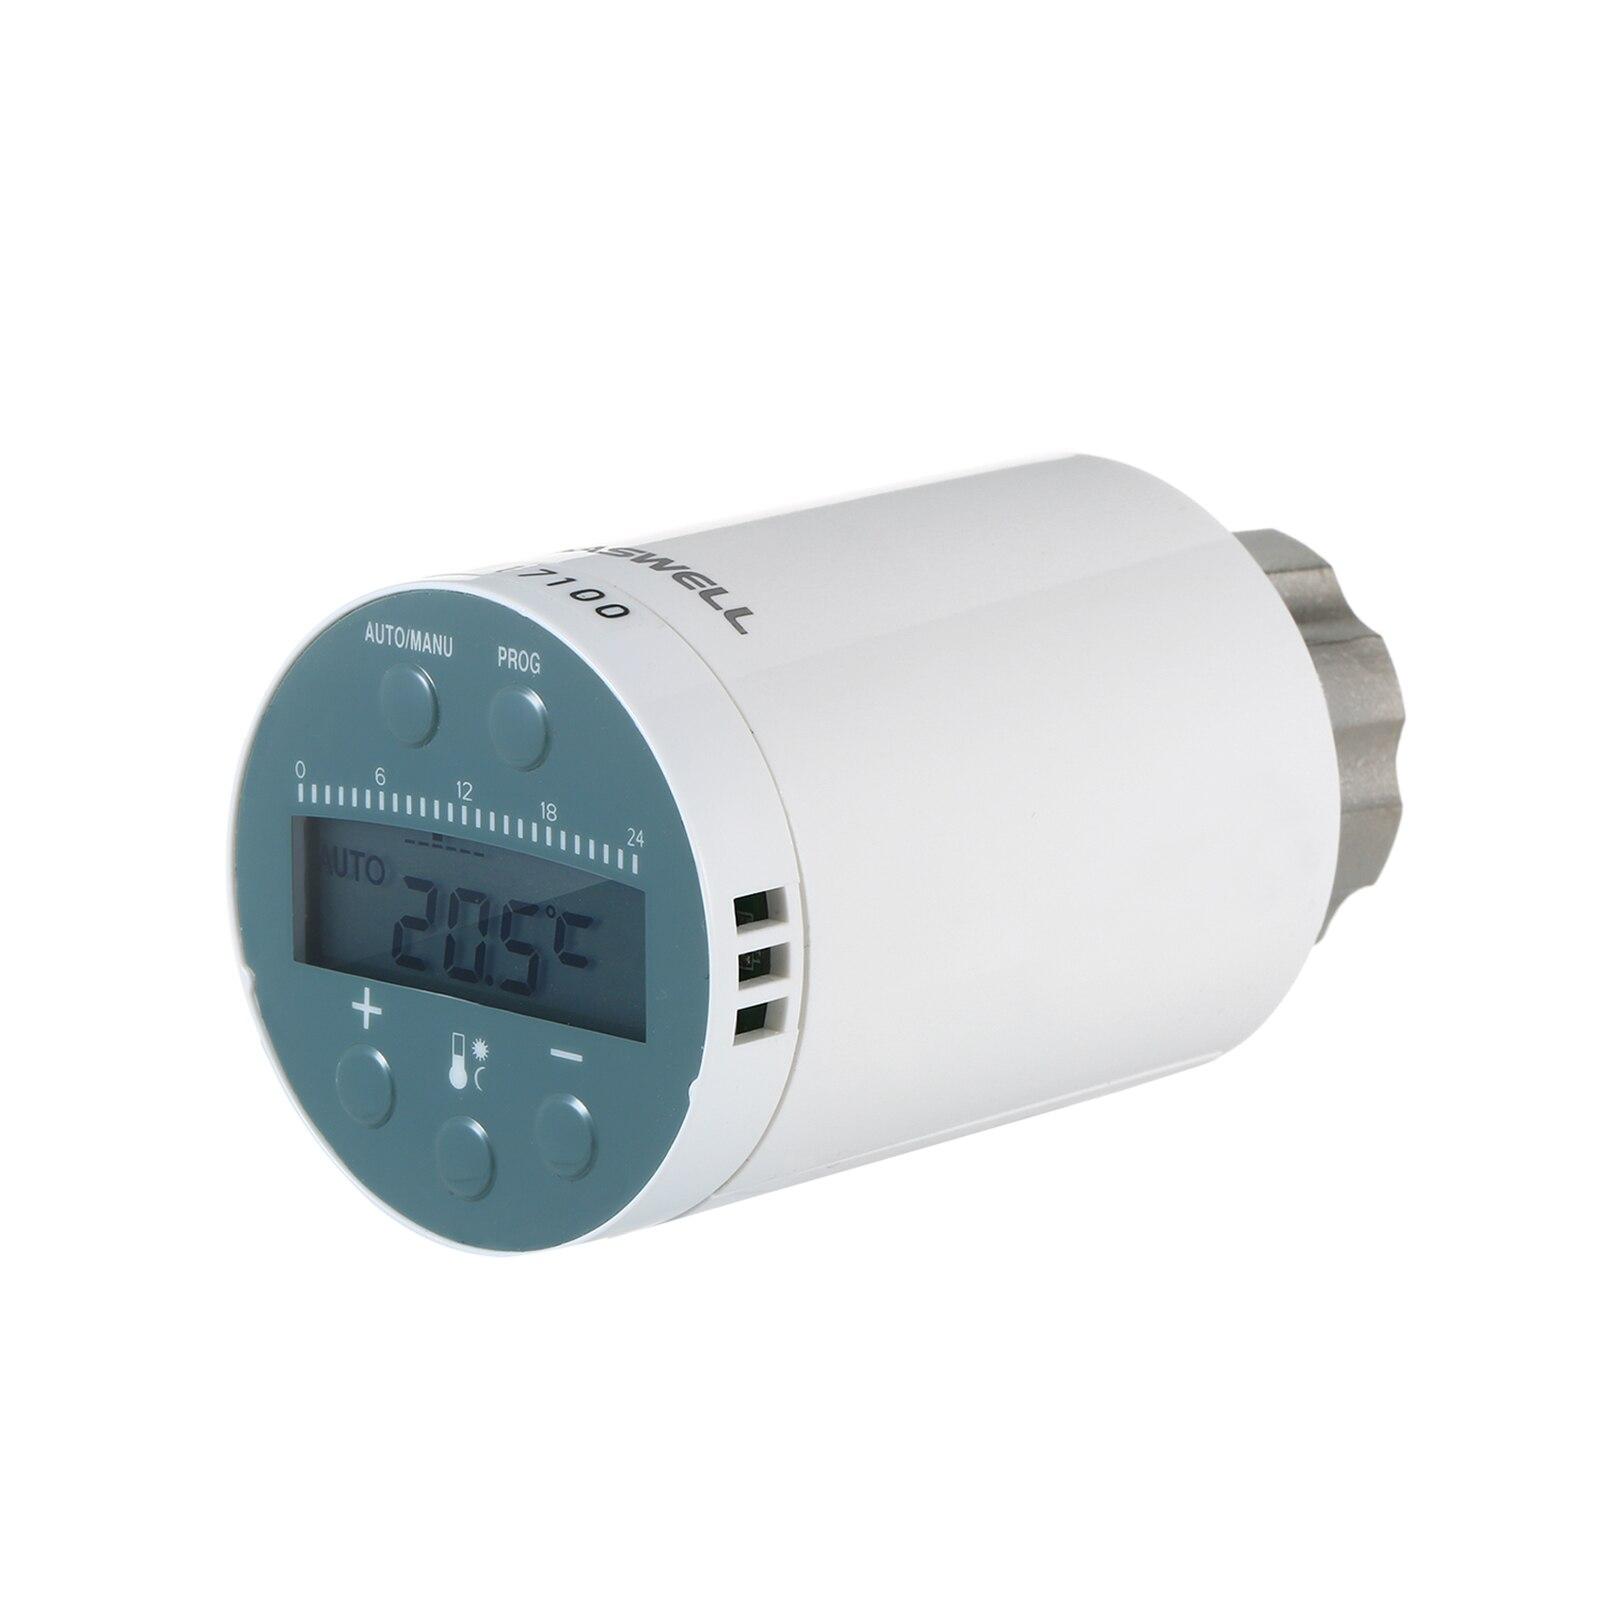 SEA801-ZIGBEE الذكية التدفئة المبرد ترموستات لالامازون اليكسا جوجل برمجة المشعاع الحراري Valv تحكم